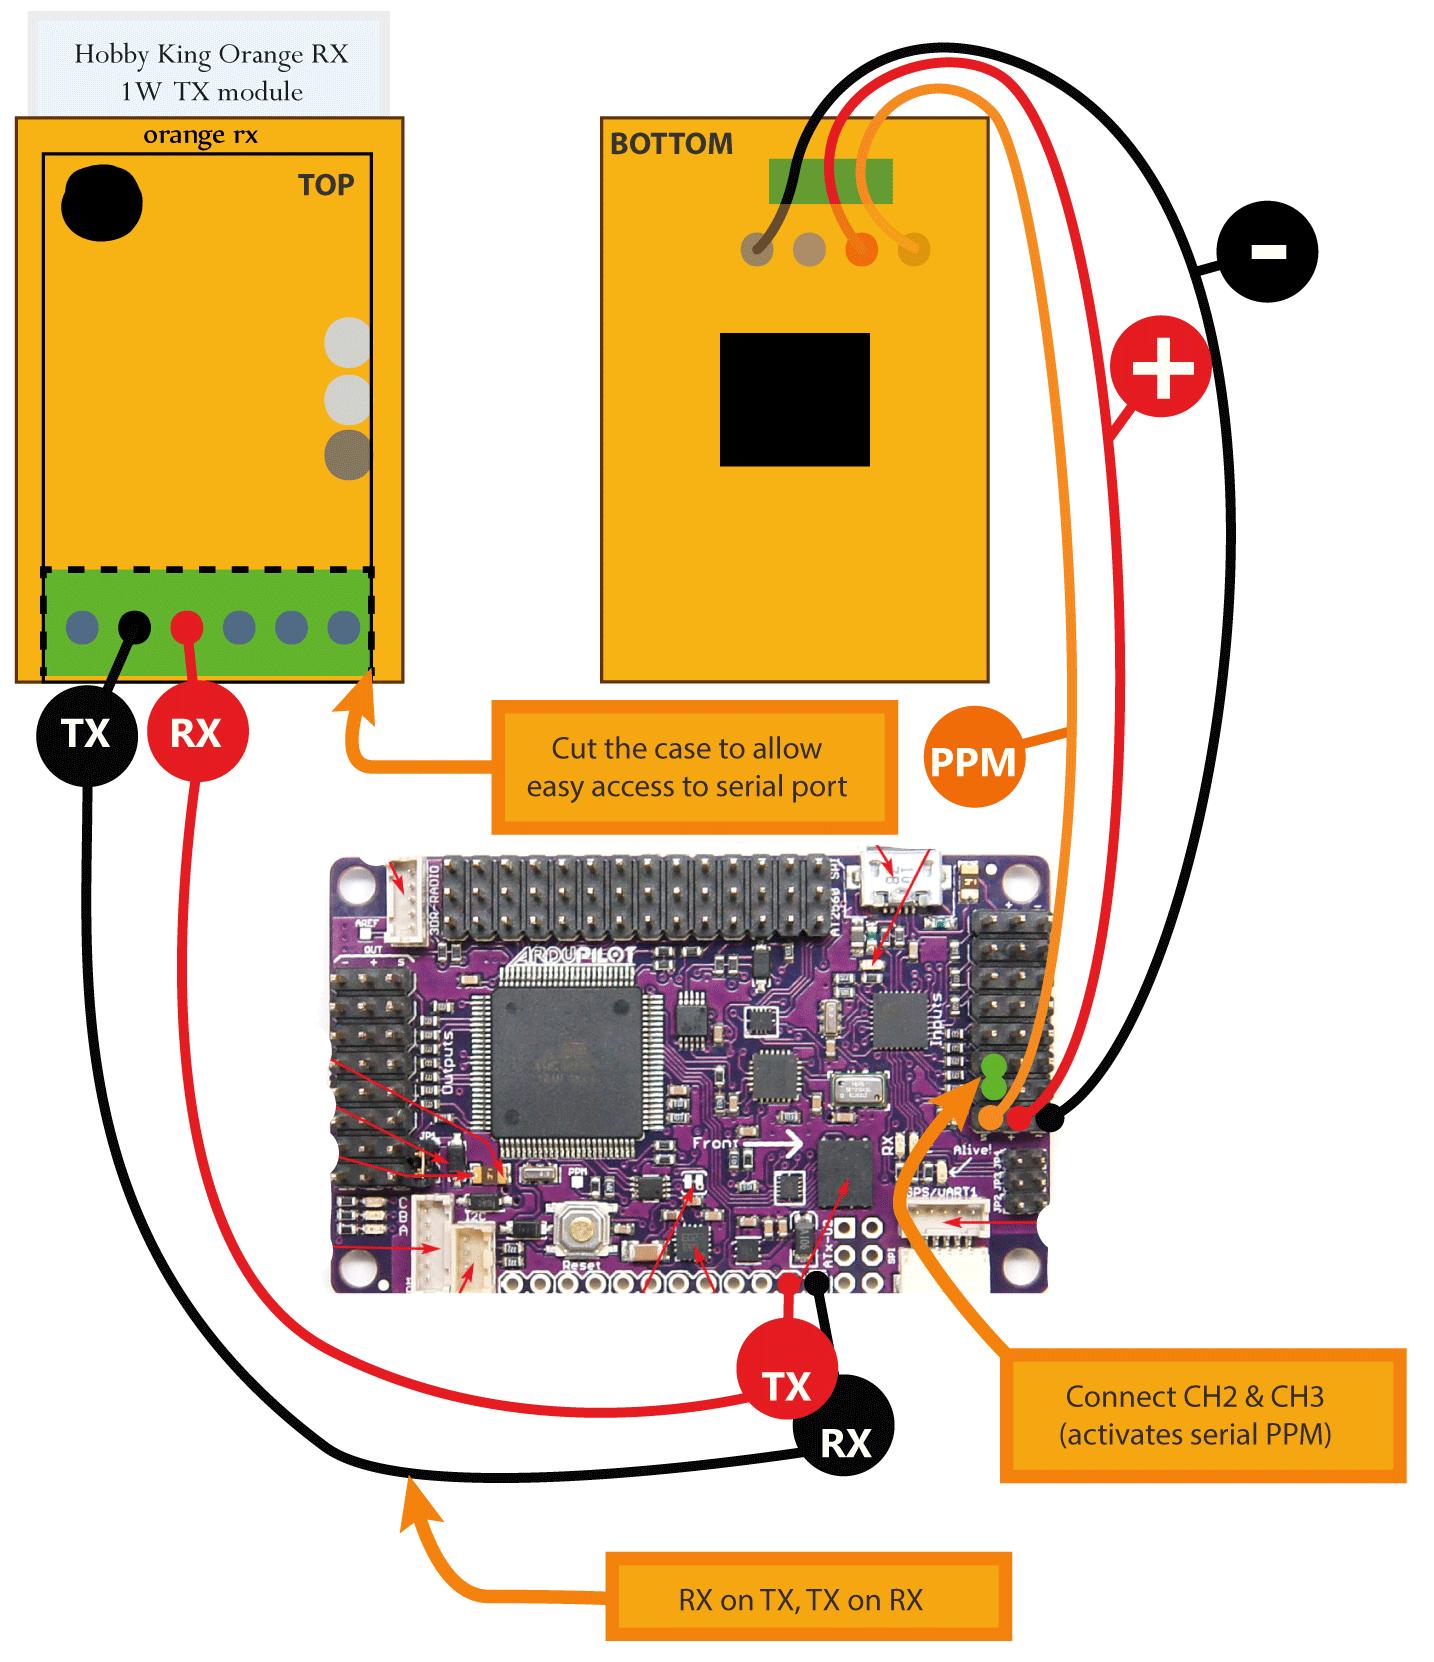 Taranis X8r Cc3d Wiring Diagram Explained Diagrams Frsky With Orange Rx Diy U2022